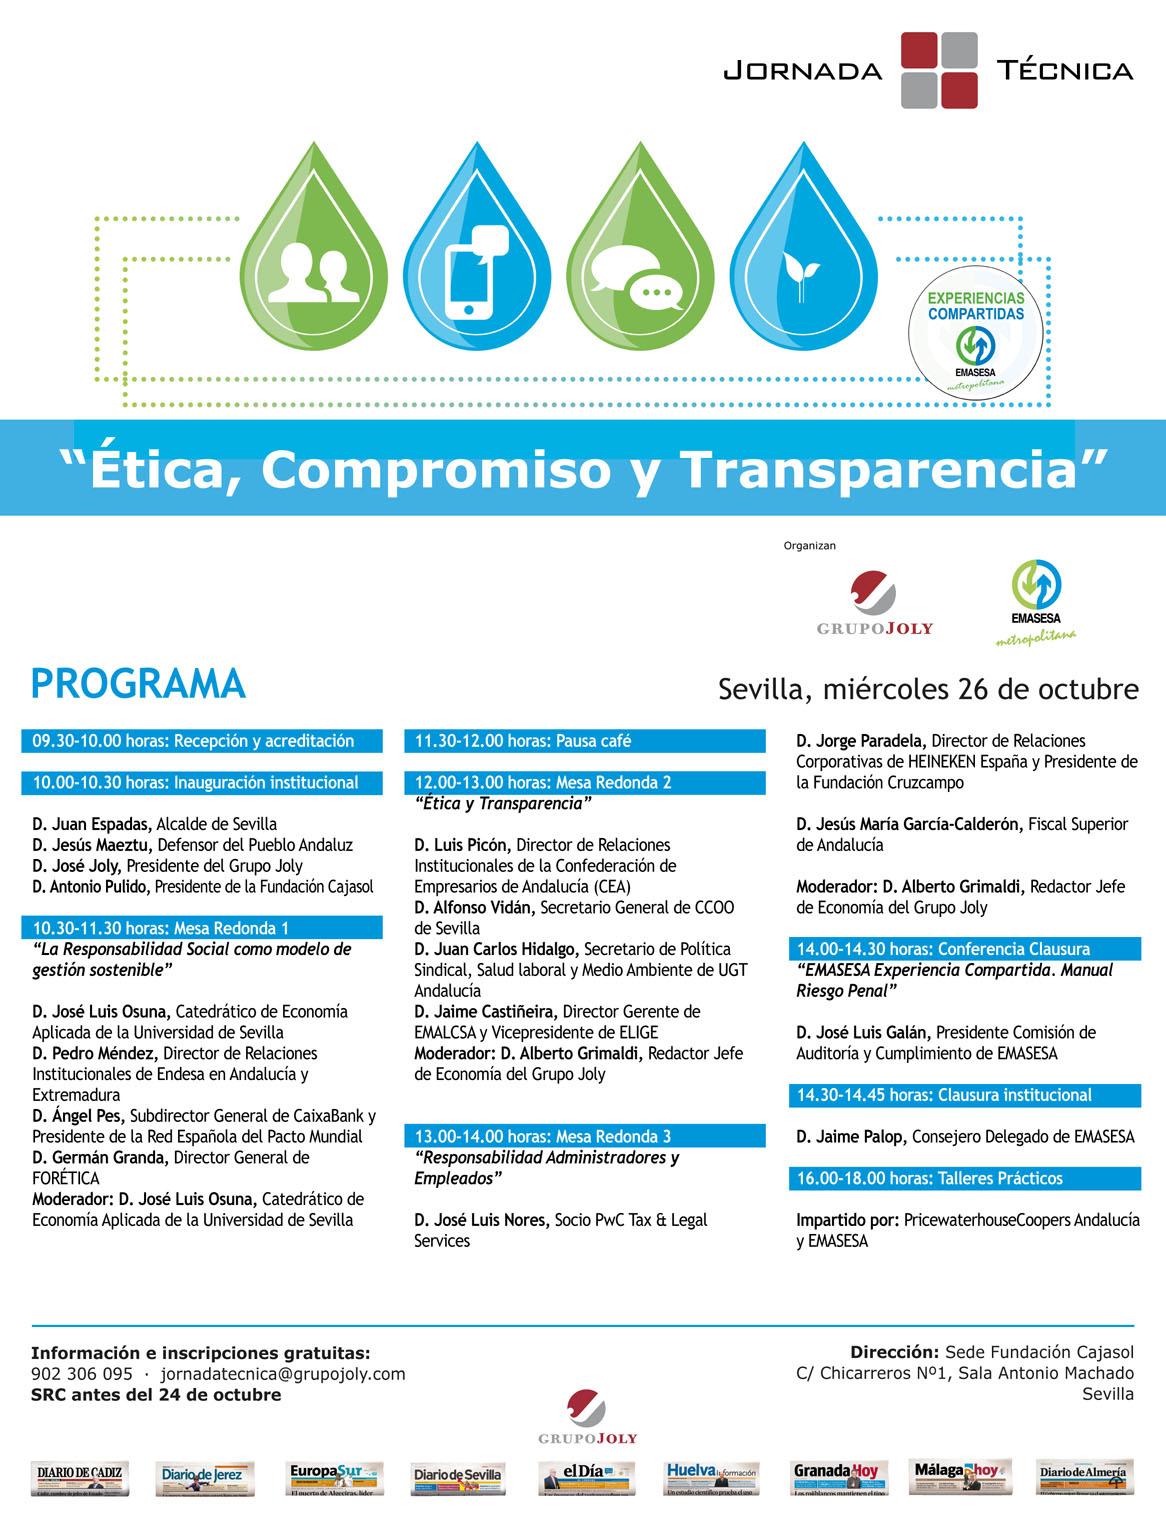 Programa. Jornada Técnica Ética, Compromiso y Transparencia